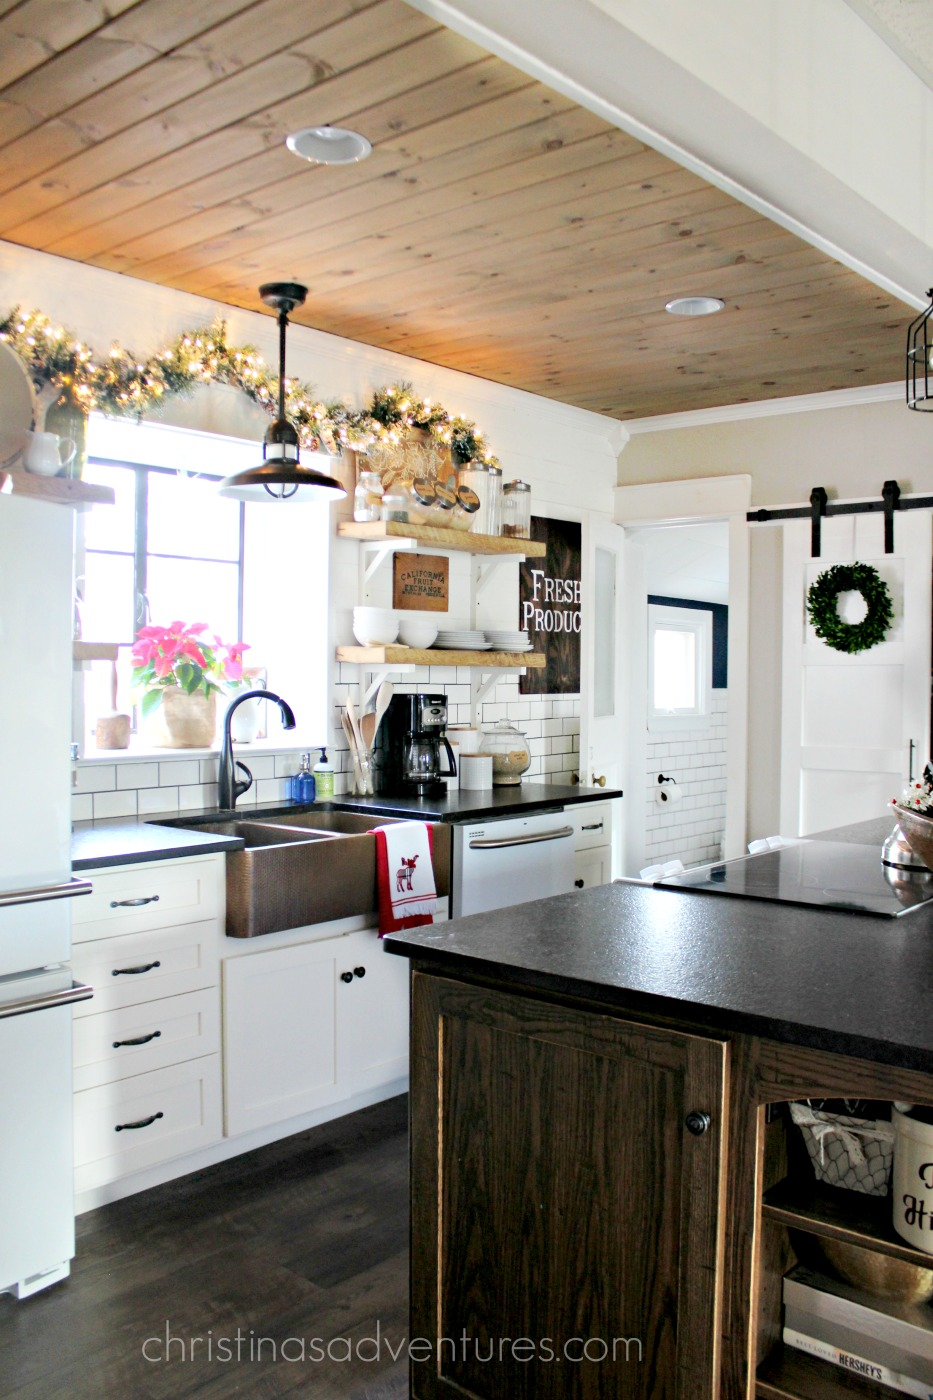 craigslist kitchen island undermount stainless steel sink farmhouse christmas - christinas adventures